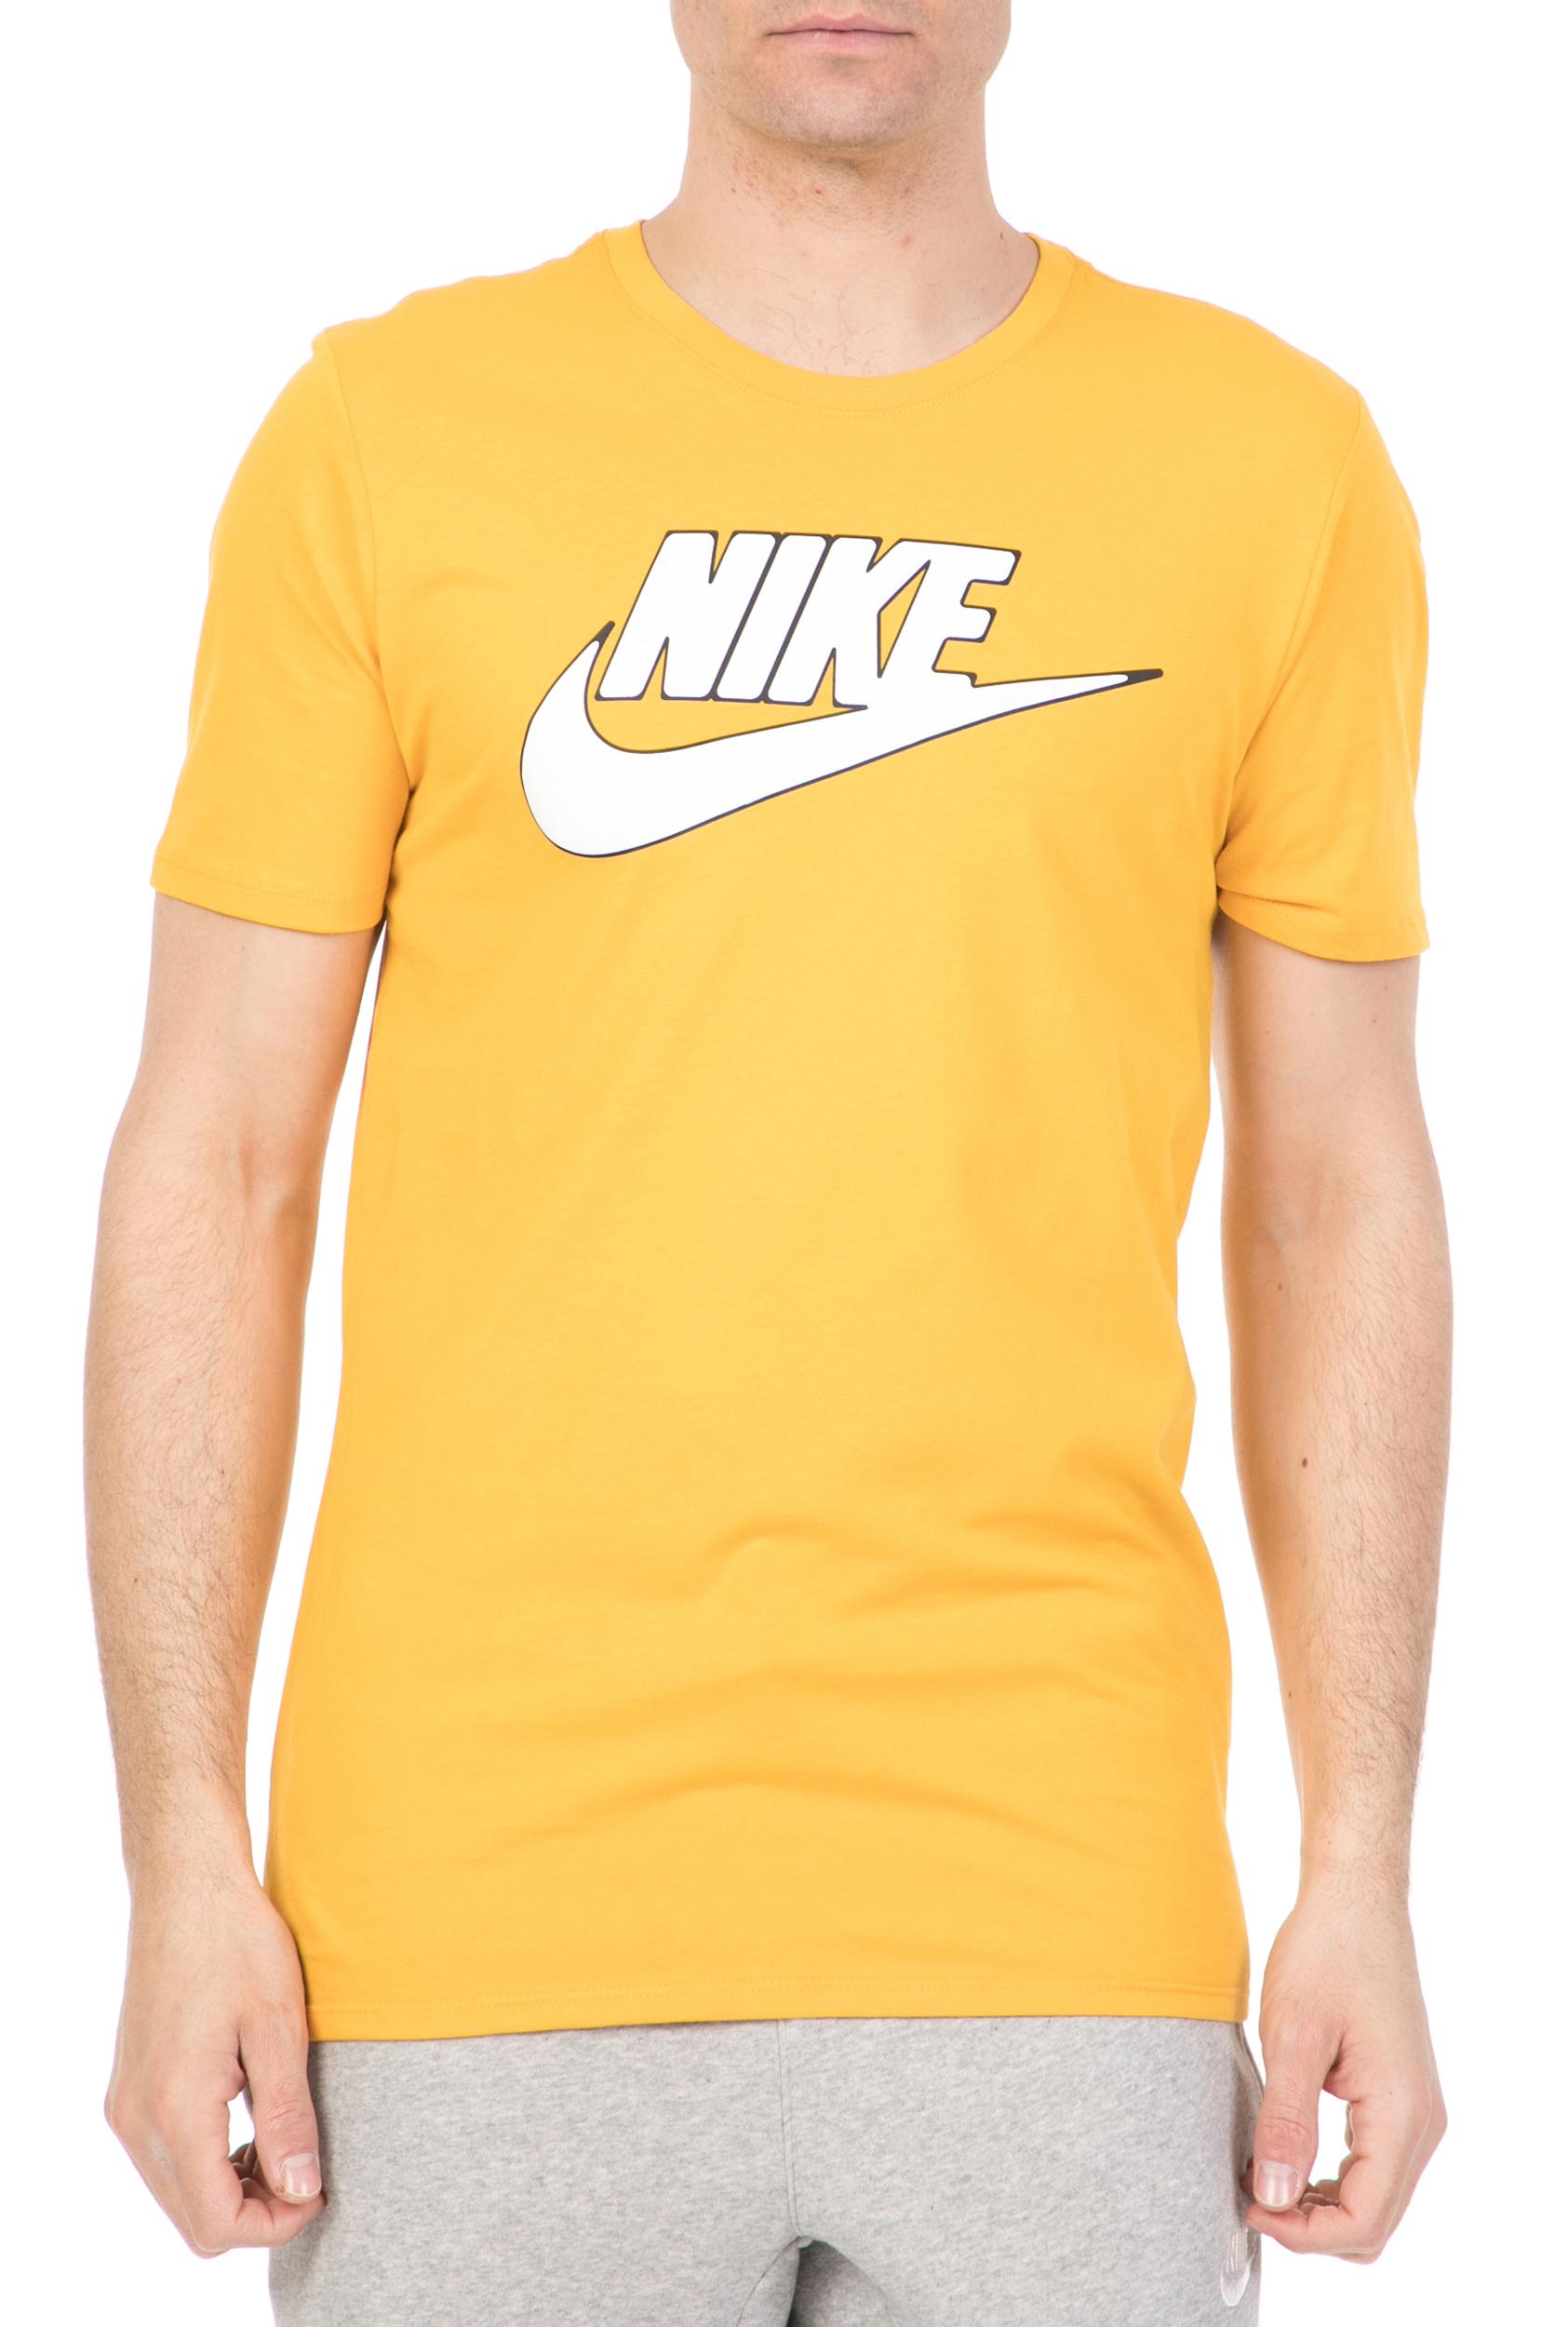 f4e203dd972b NIKE - Ανδρική κοντομάνικη μπλούζα NSW TEE TABLE HBR 2 κίτρινη